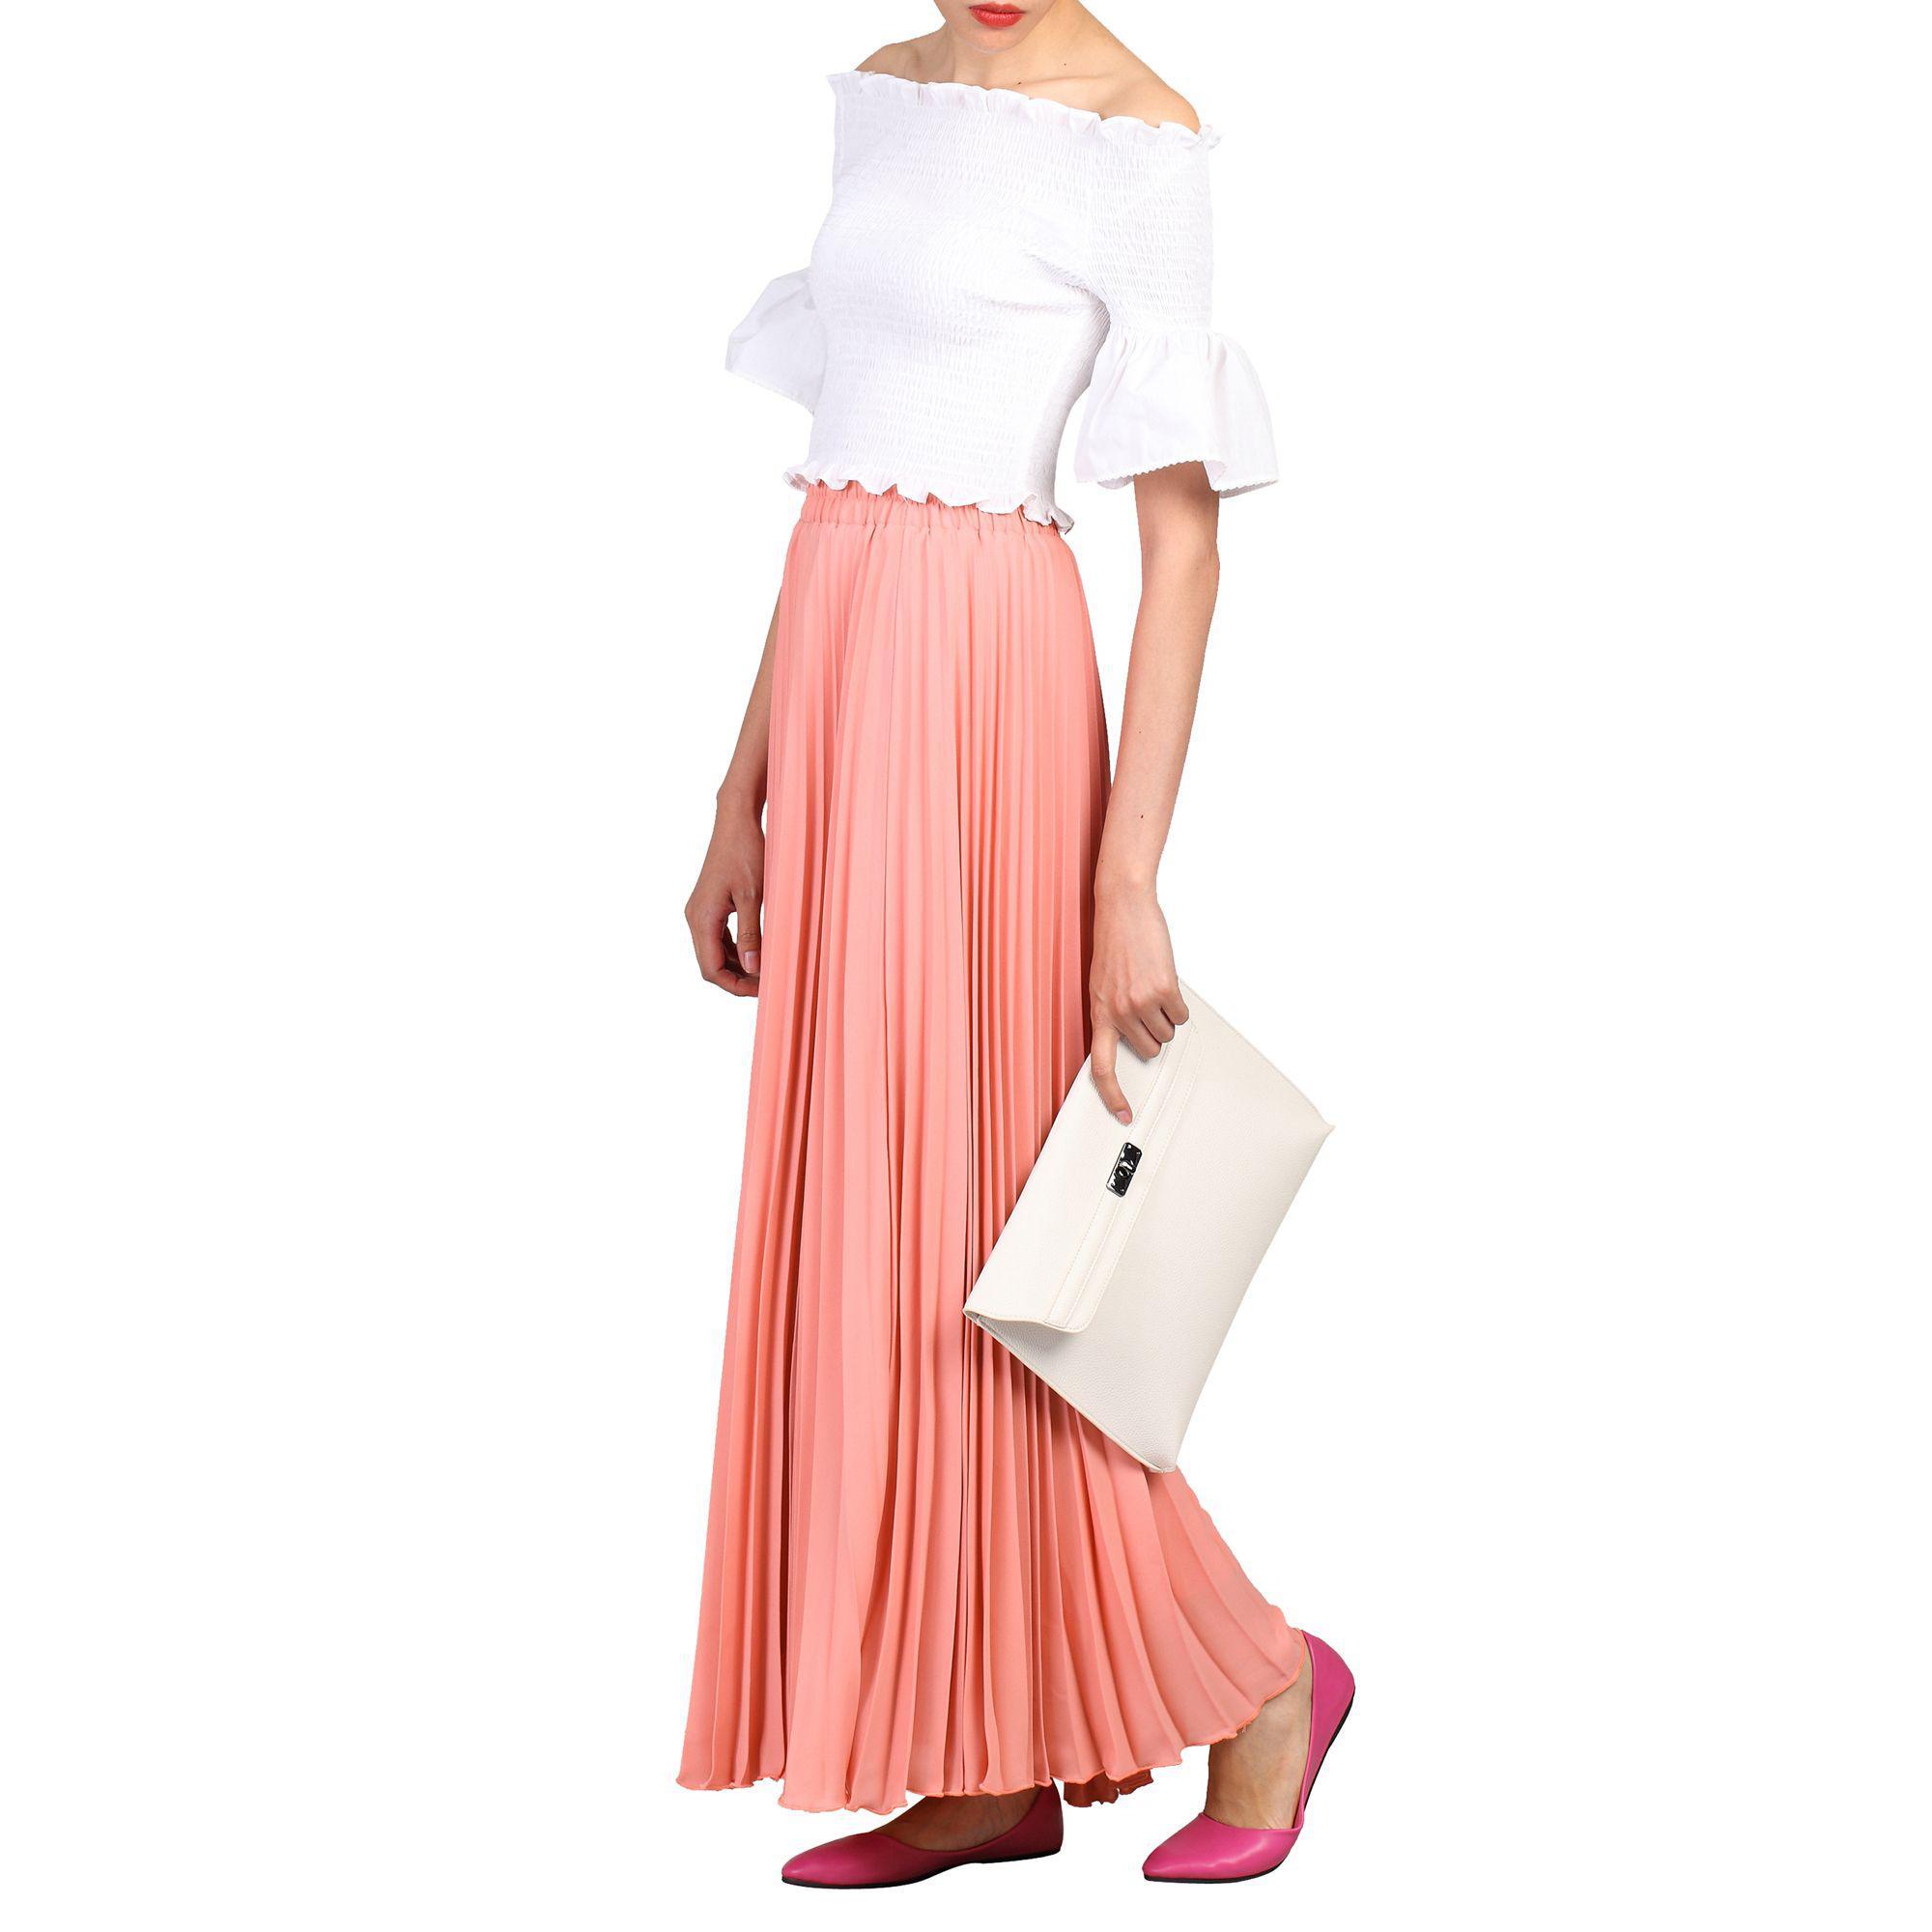 3b4b6cefc2 Jolie Moi Peach Crepe Pleated Maxi Skirt in Pink - Lyst